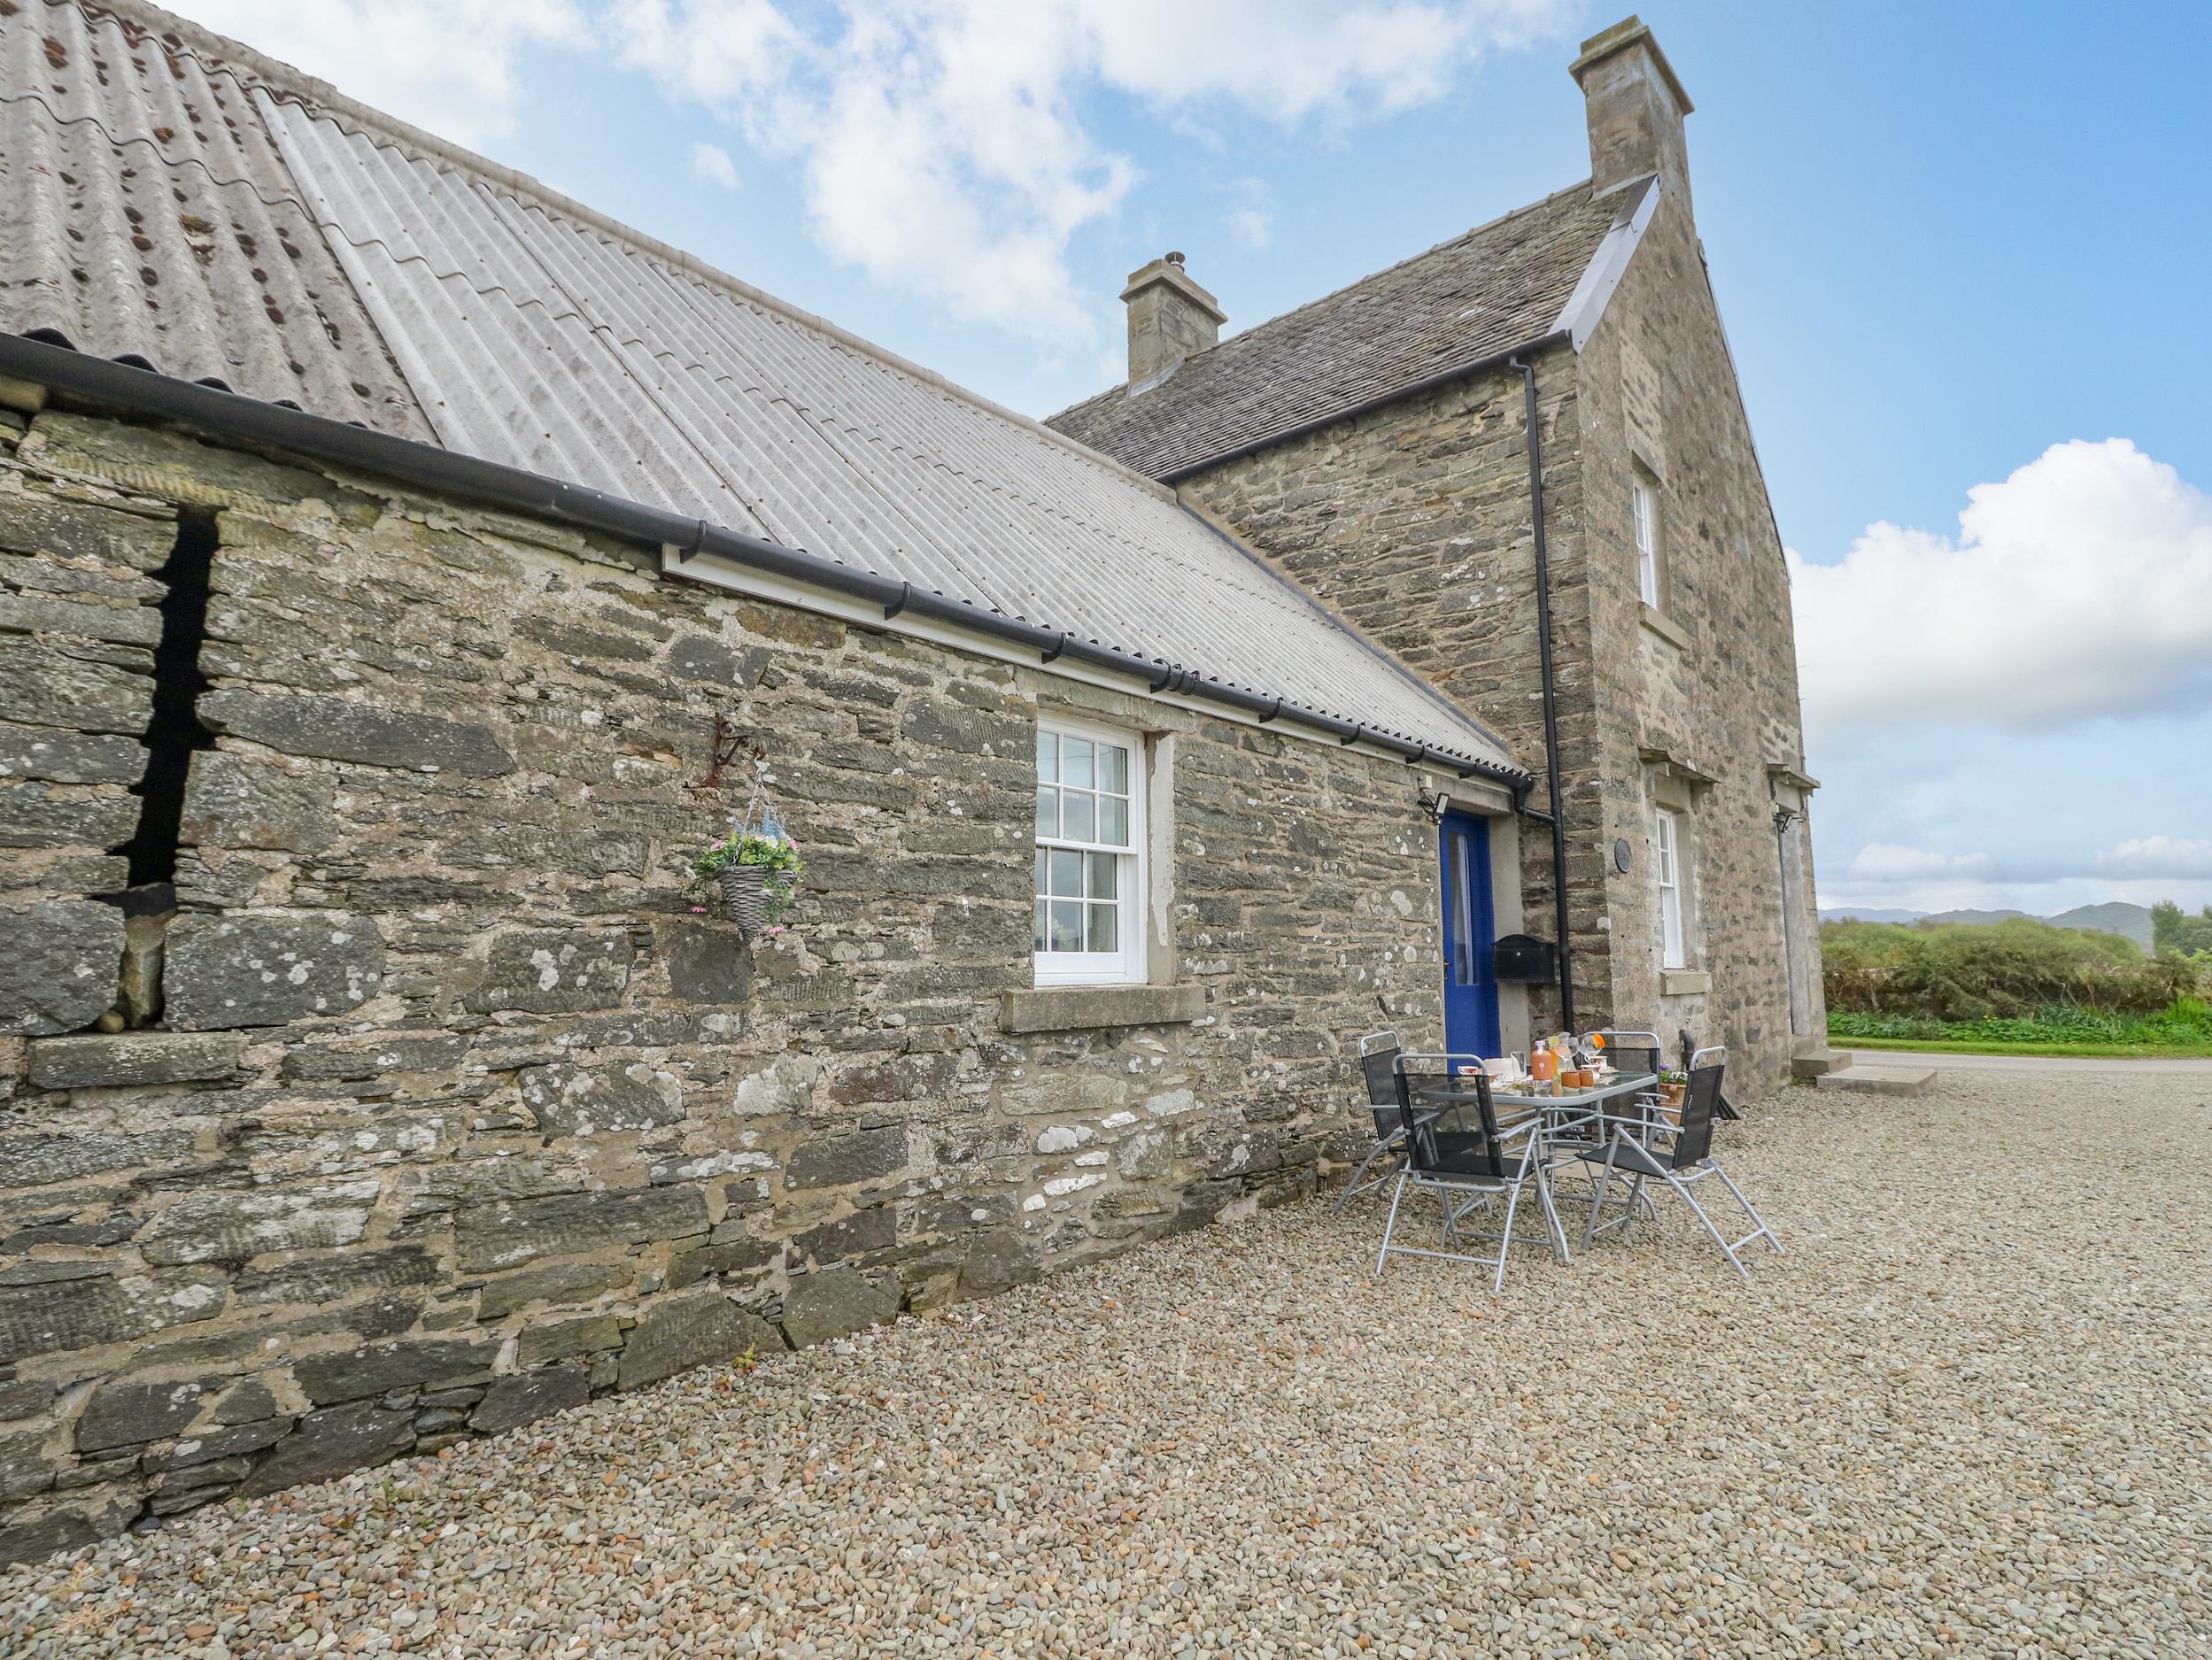 Seaview-Barsloisnach Cottage, Kilmartin